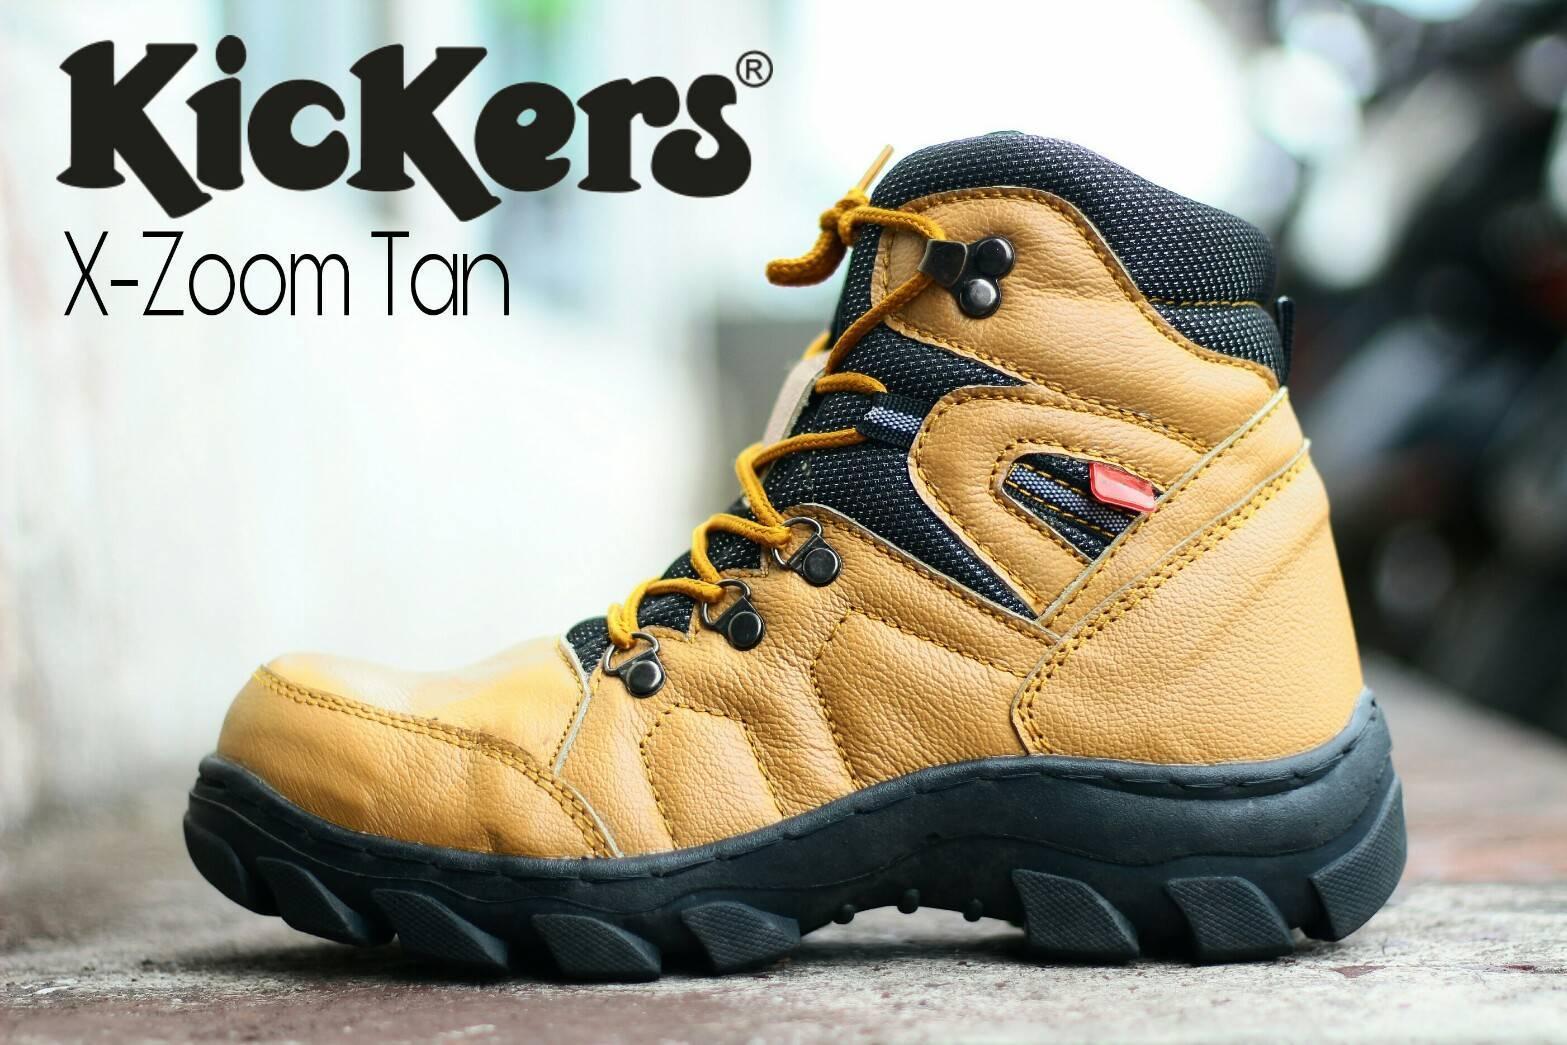 Kehebatan Sepatu Boots Pria Predator Army California Suede Mercy Nike Safety Tracking Ujung Besi Saefy Kickers X Zoom Kulit Hiking Touring Bikers